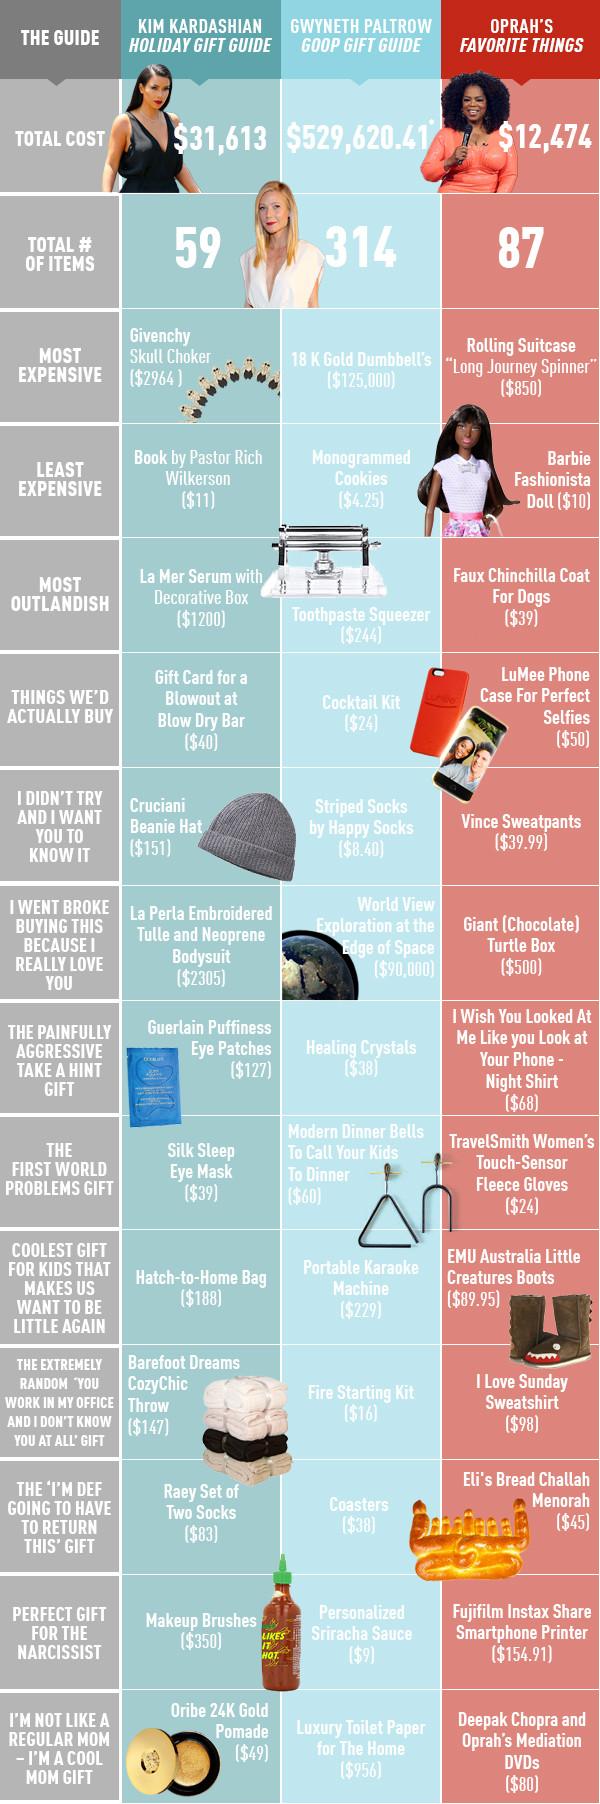 Gift Guide Comparison Infographic